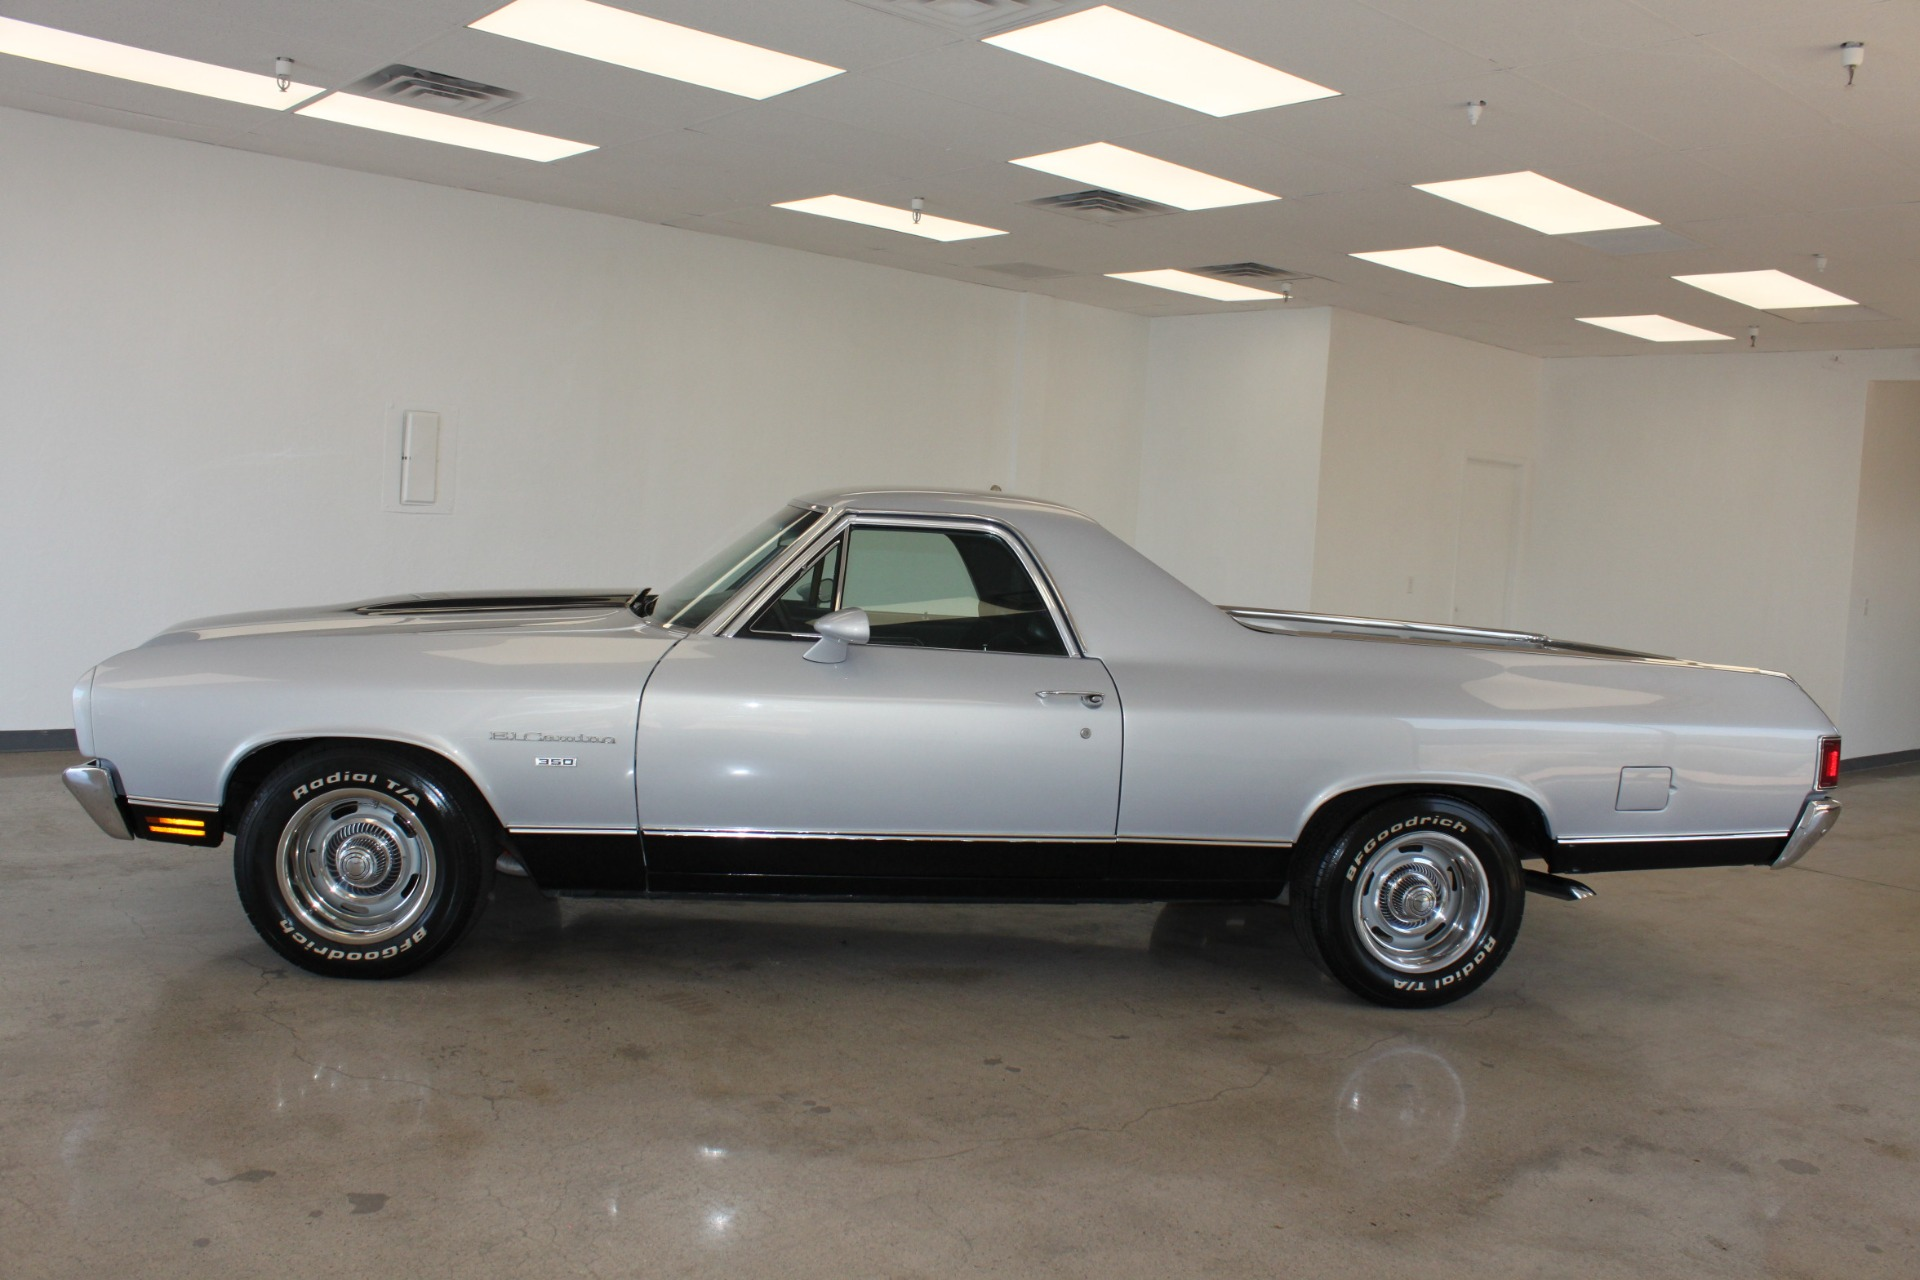 Used-1970-Chevrolet-El-Camino-Custom-350-ci-Wagoneer